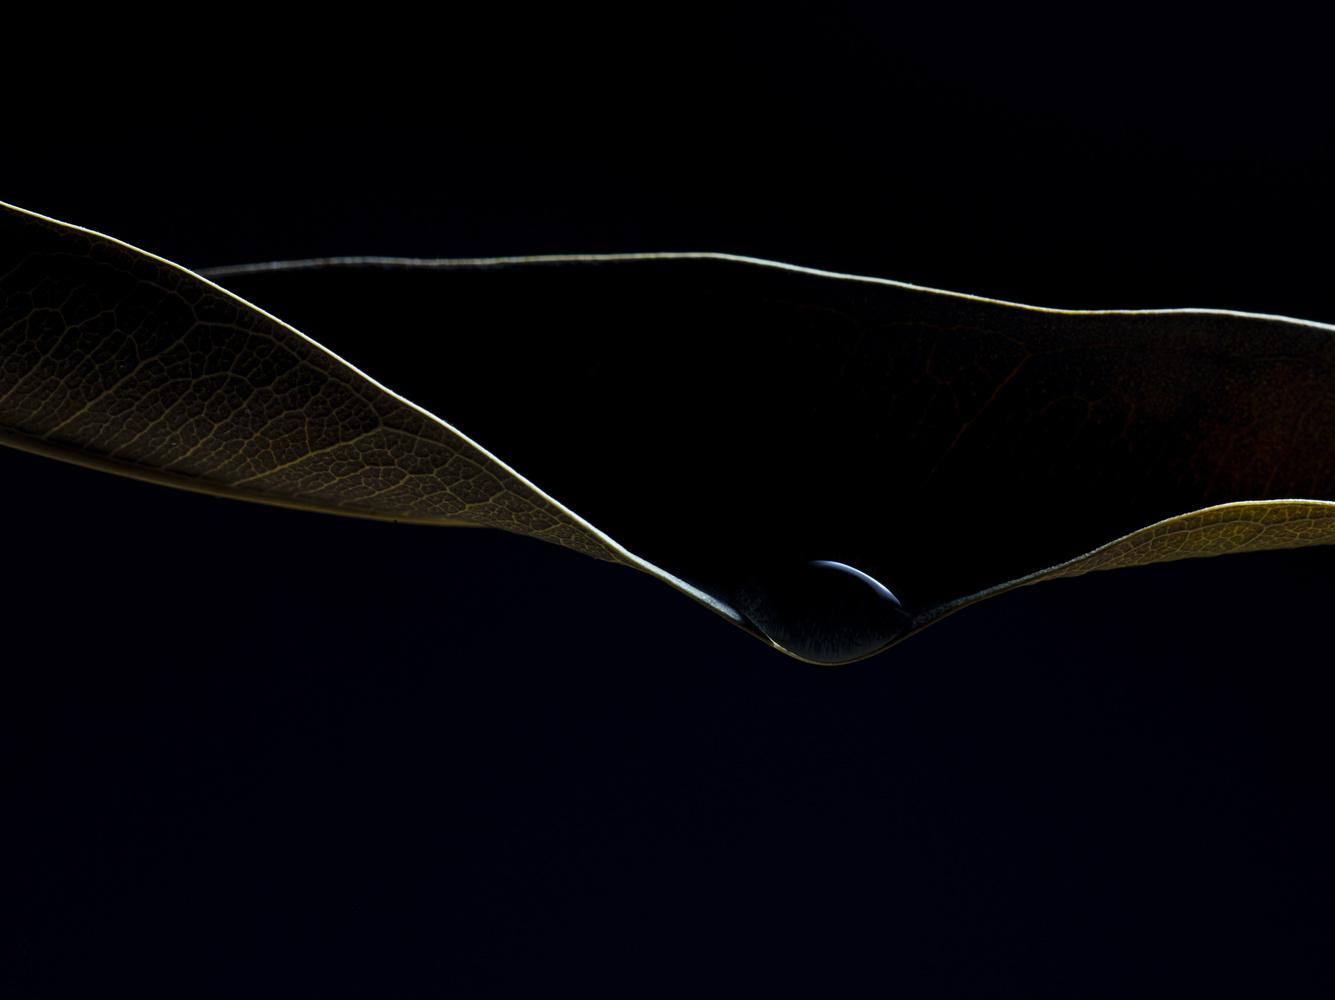 Light and dark by Attila Michael Zsaki